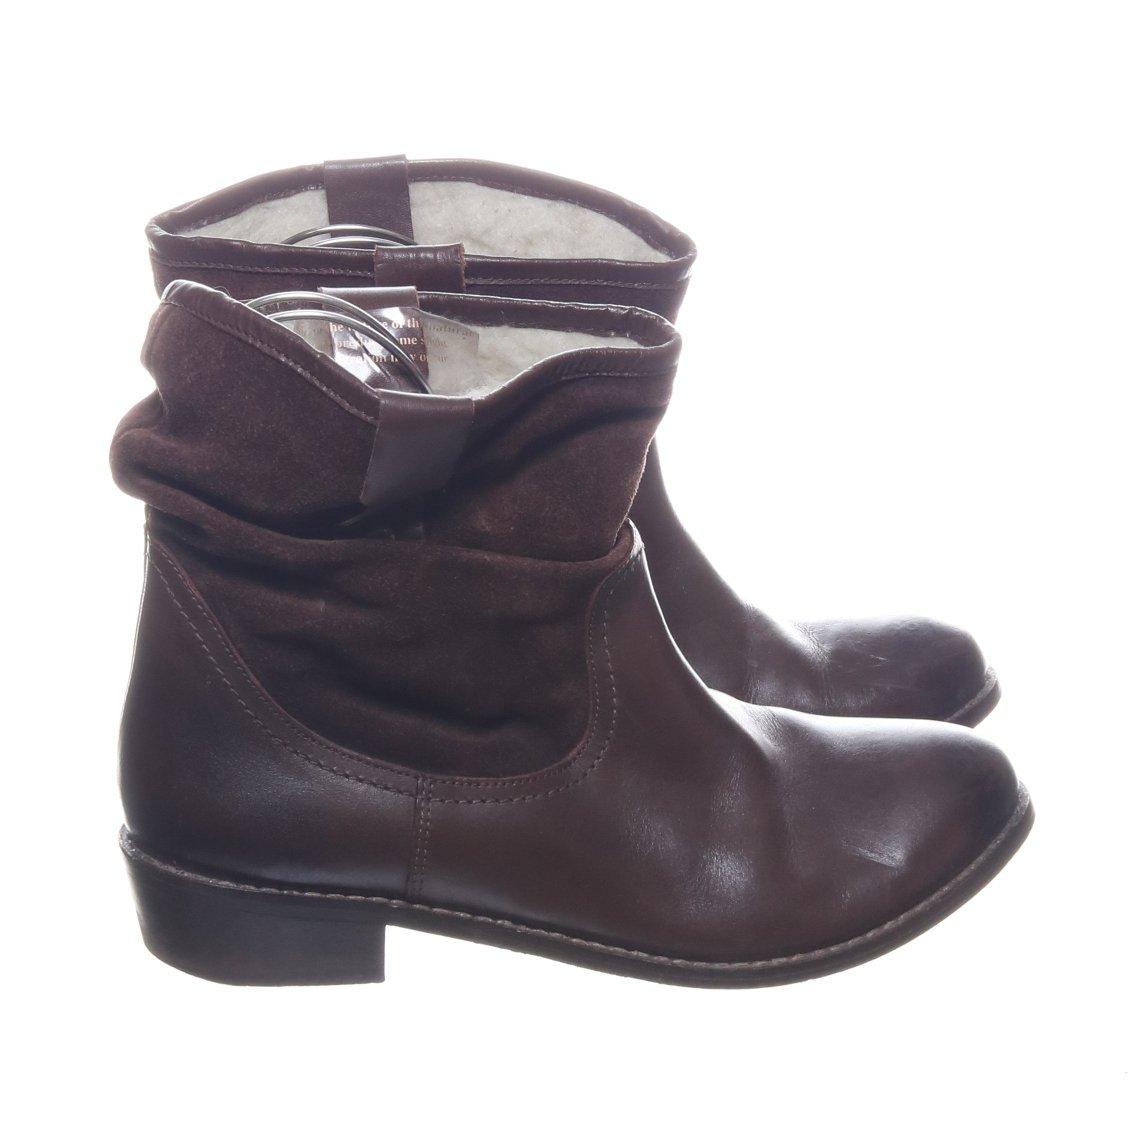 Redfoot, Boots, Strl: 39, Brun, Skinn